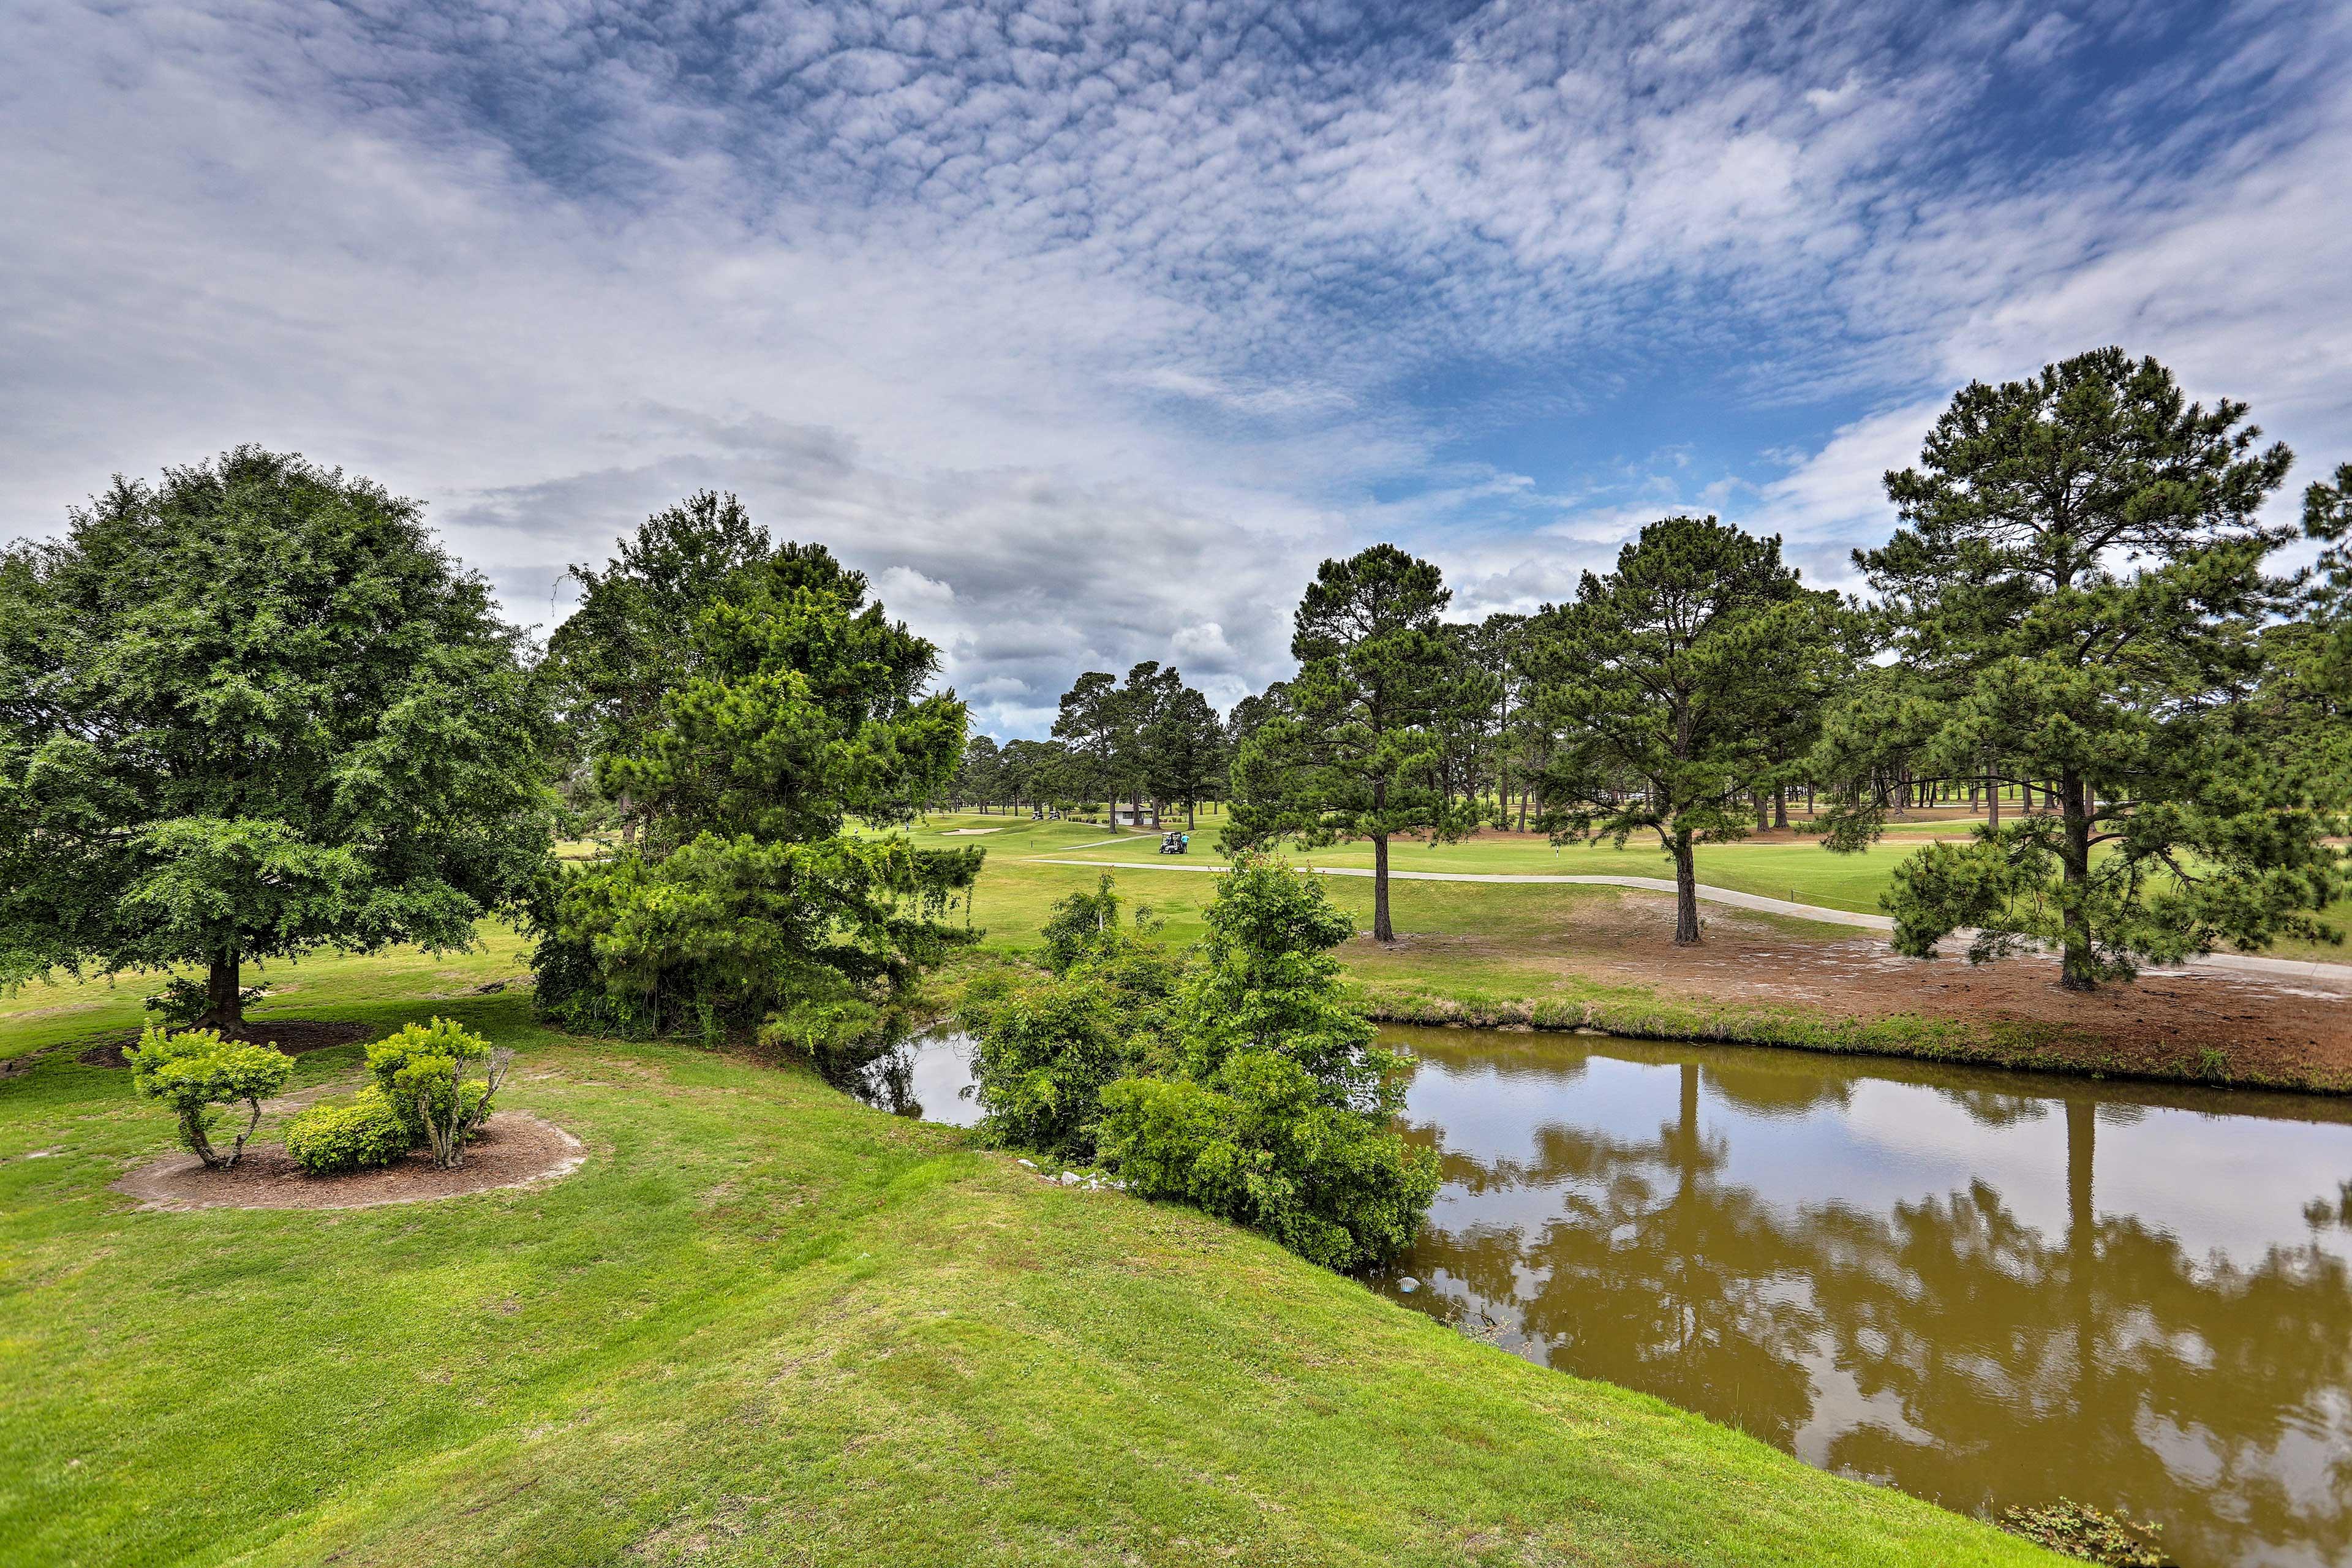 Views of Myrtlewood's Pine Hills Golf Course